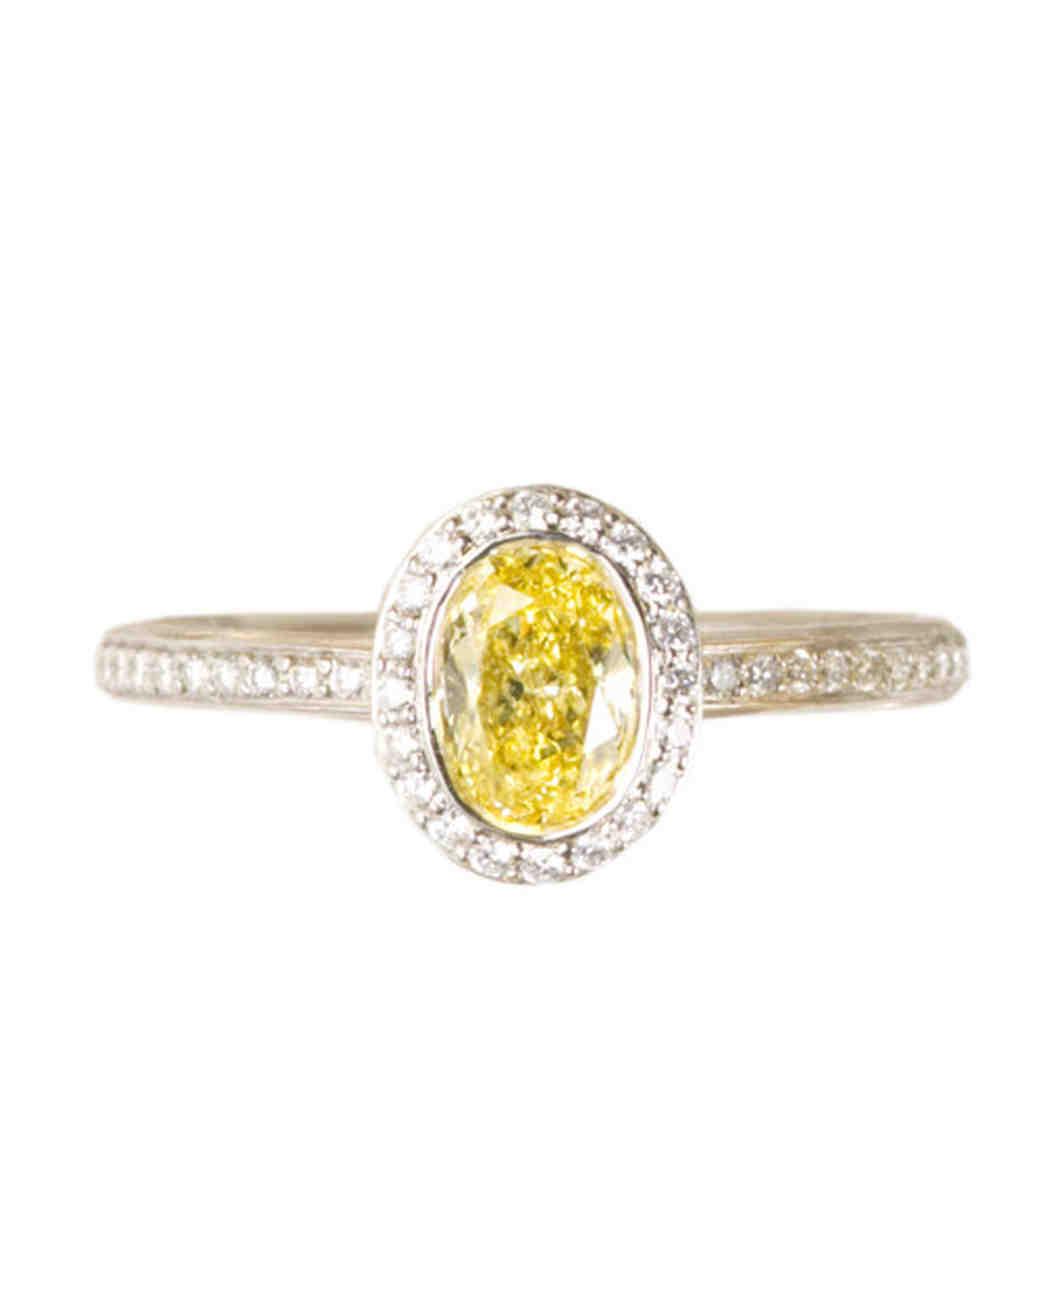 msw_sum10_yellow_ring_ritani.jpg